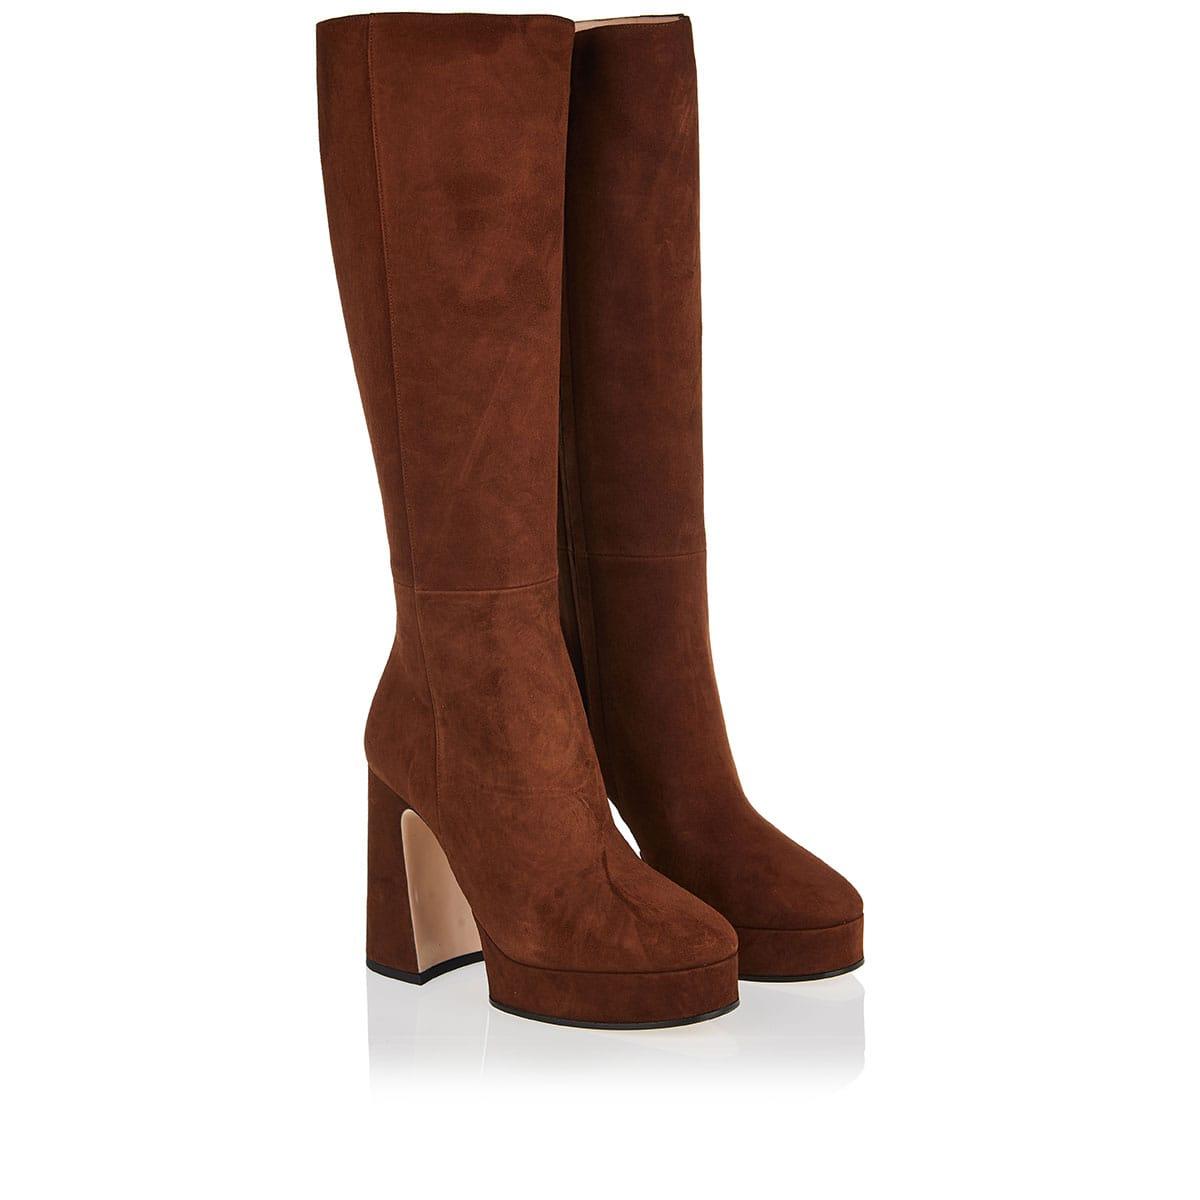 Madame suede platform boots